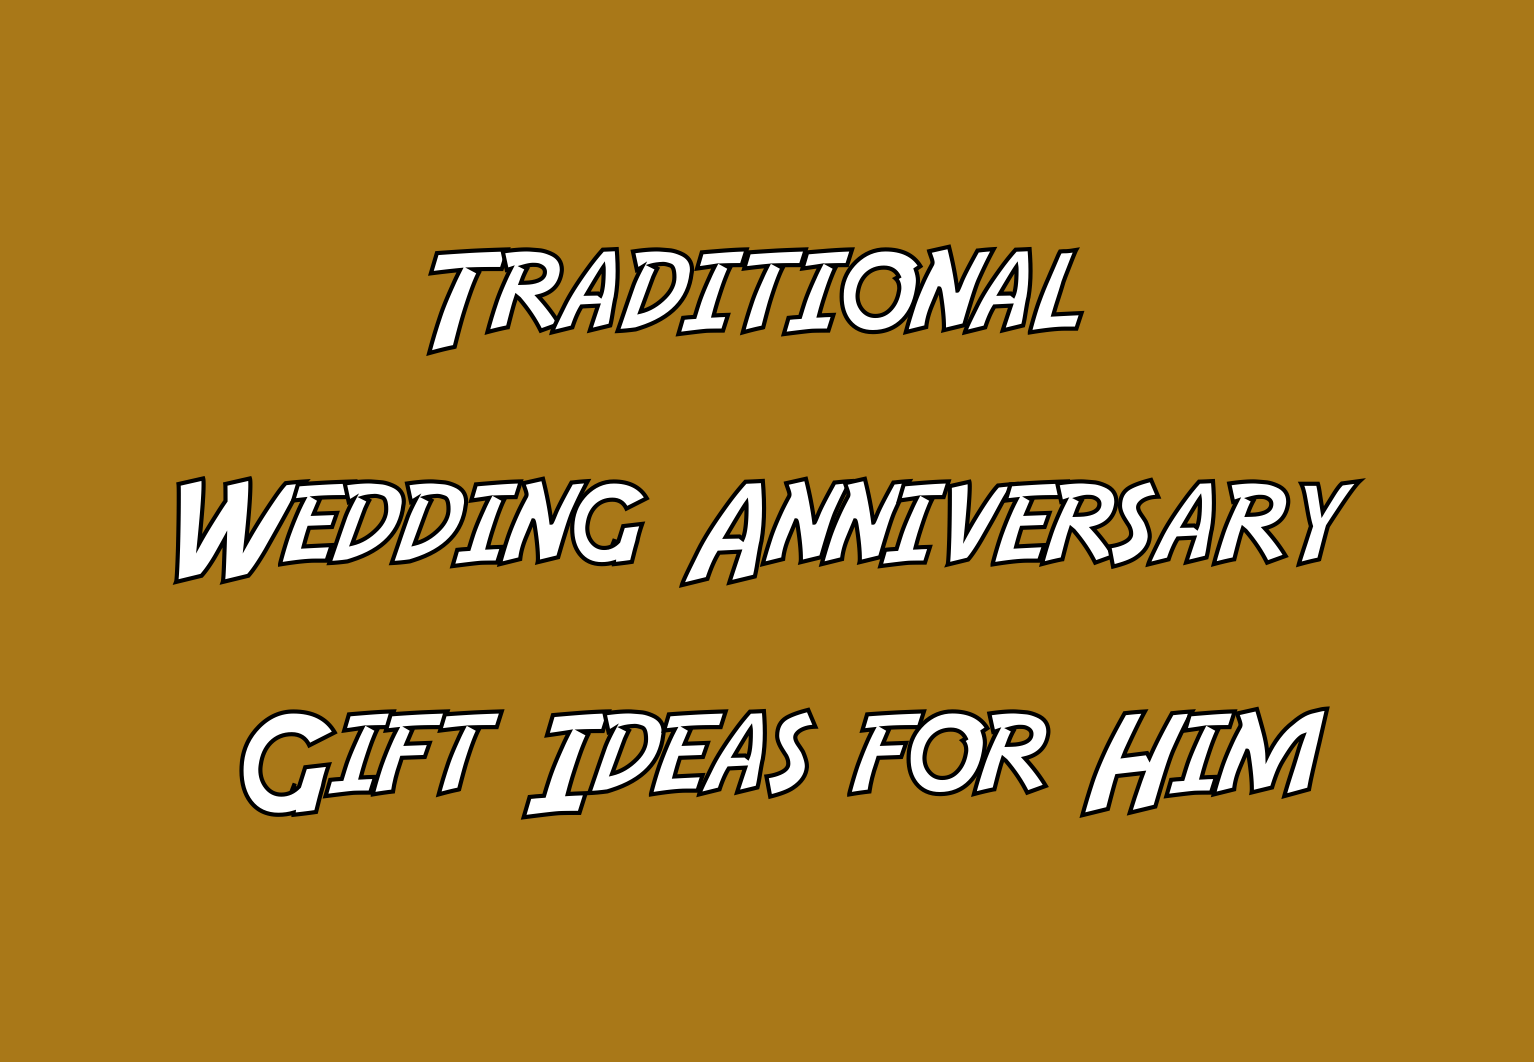 21st Wedding Anniversary Gift Ideas For Him: Traditional Wedding Anniversary Gift Ideas For Him